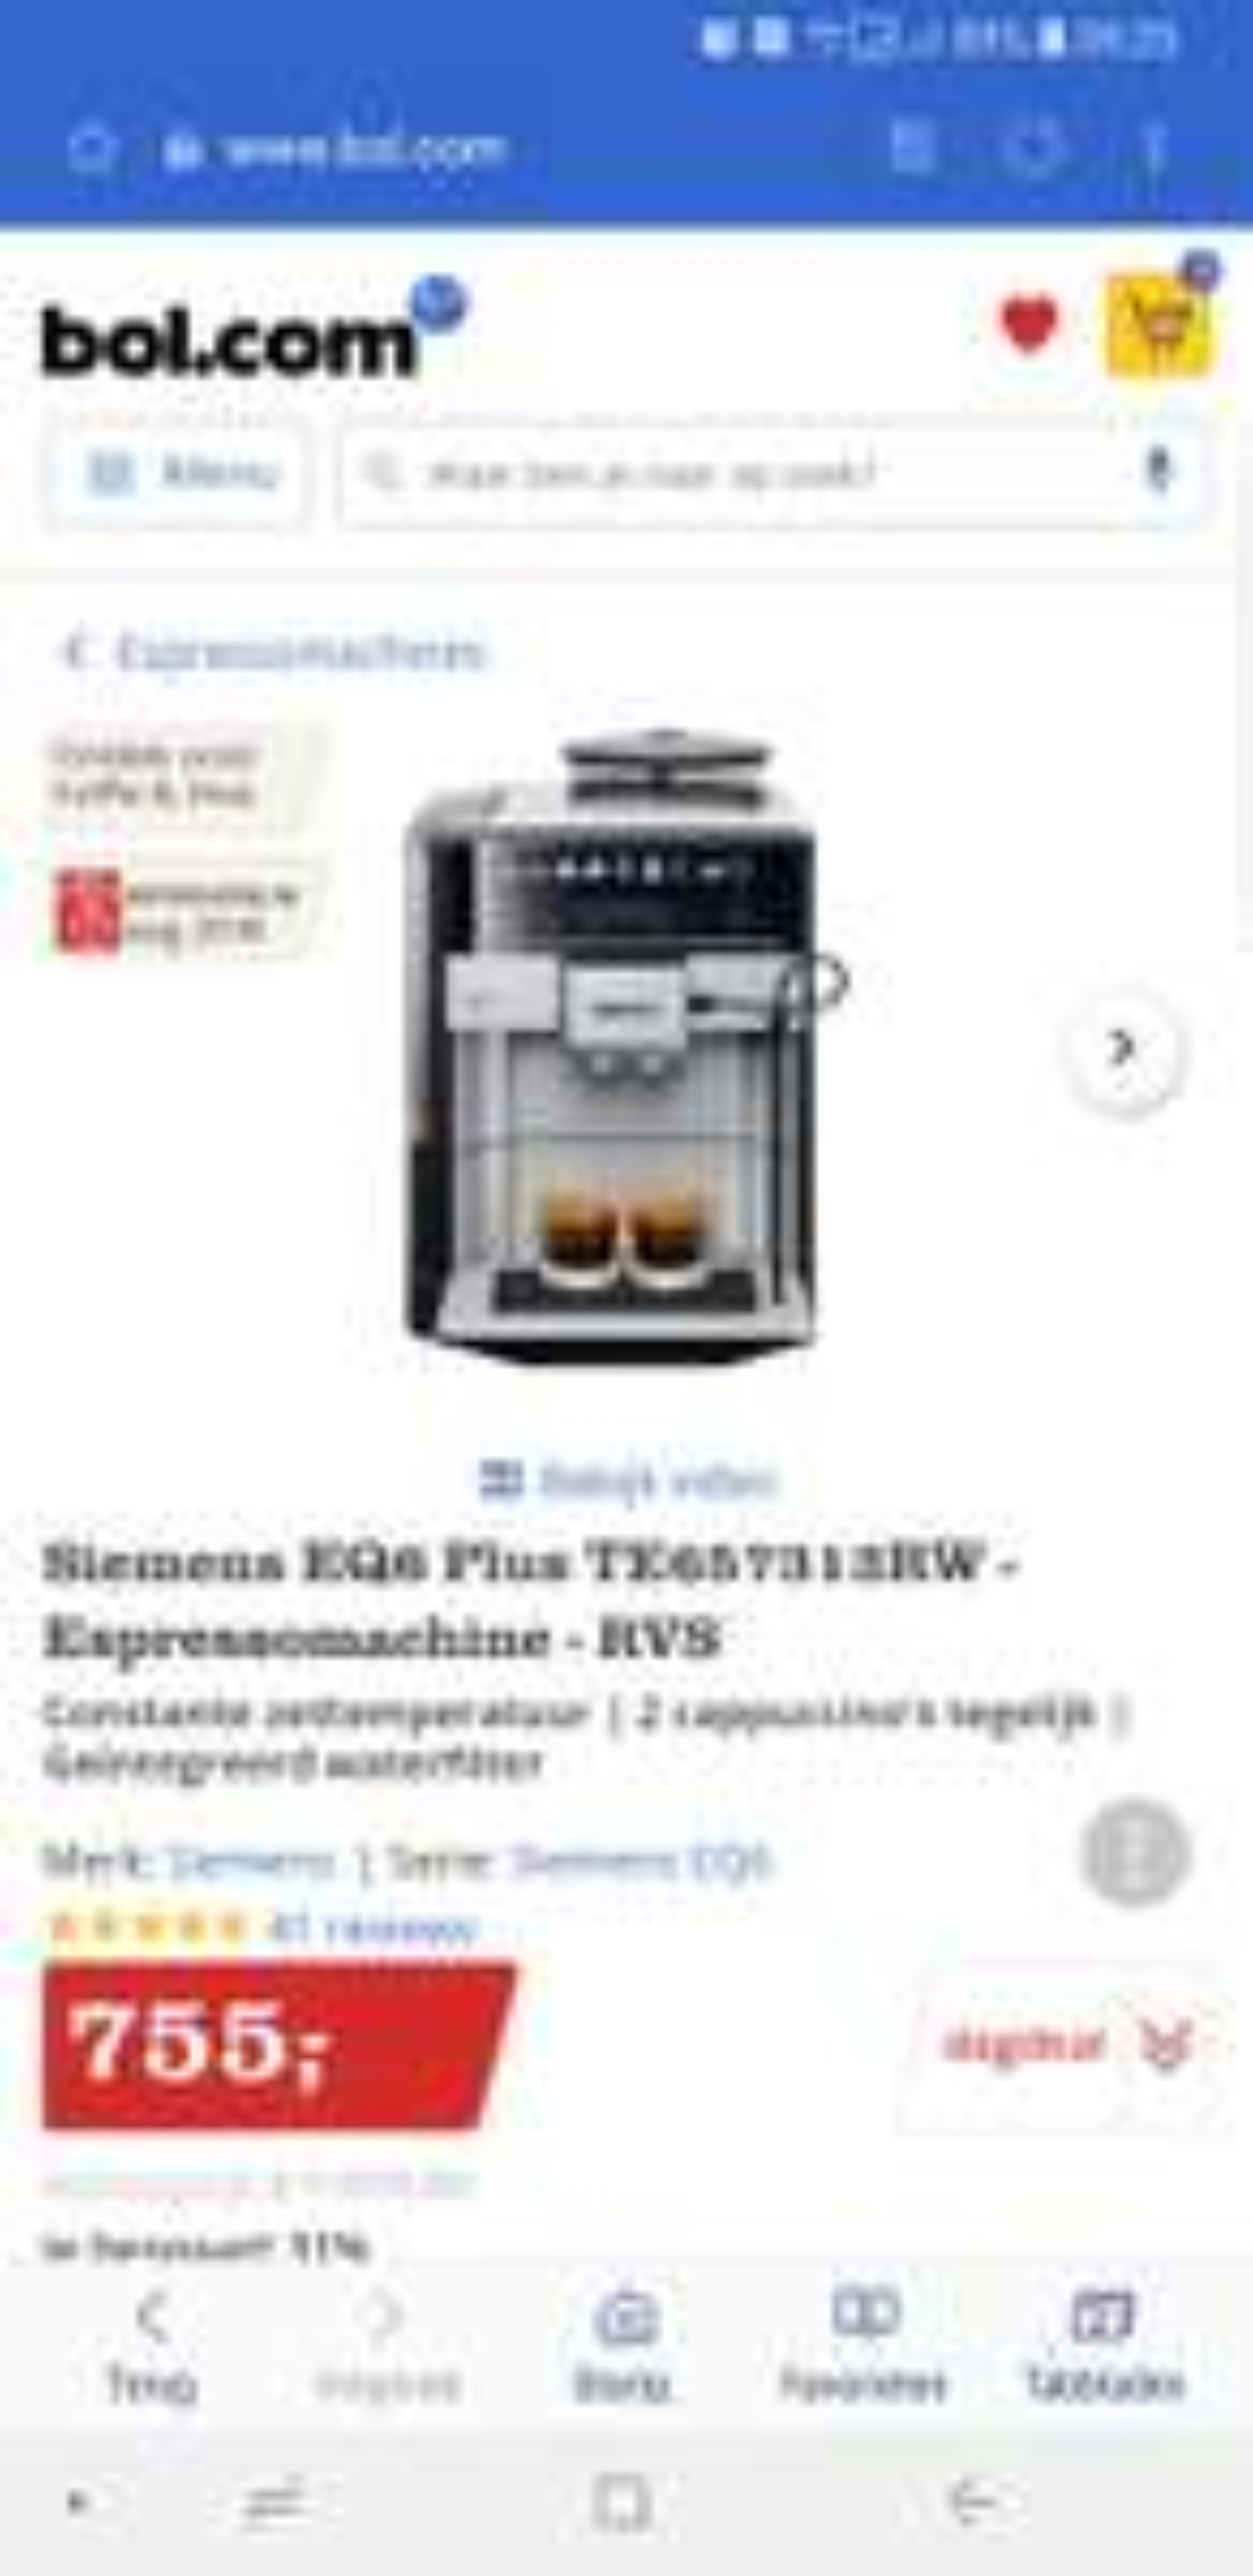 Siemens EQ6 Plus TE657313RW - Espressomachine - RVS + €50,- cashback